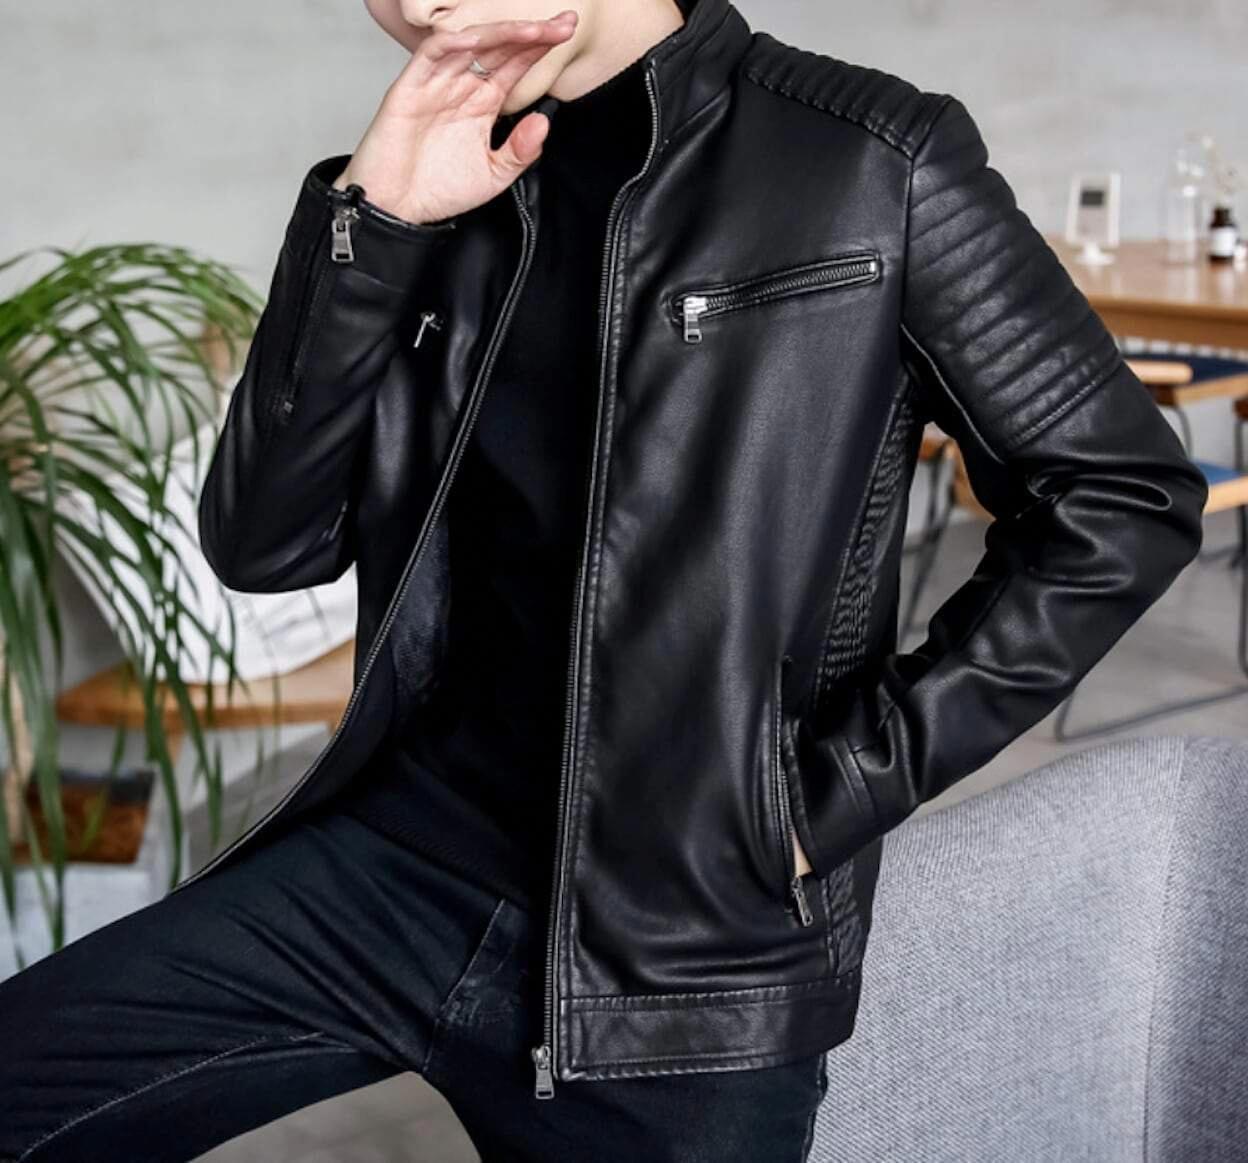 Description Mens Stand Collar Biker Jacket Fabric Faux Leather Fit Slim Fit Color Available Black Green Wine Brown S Leather Jacket Jackets Biker Jacket [ 1163 x 1248 Pixel ]